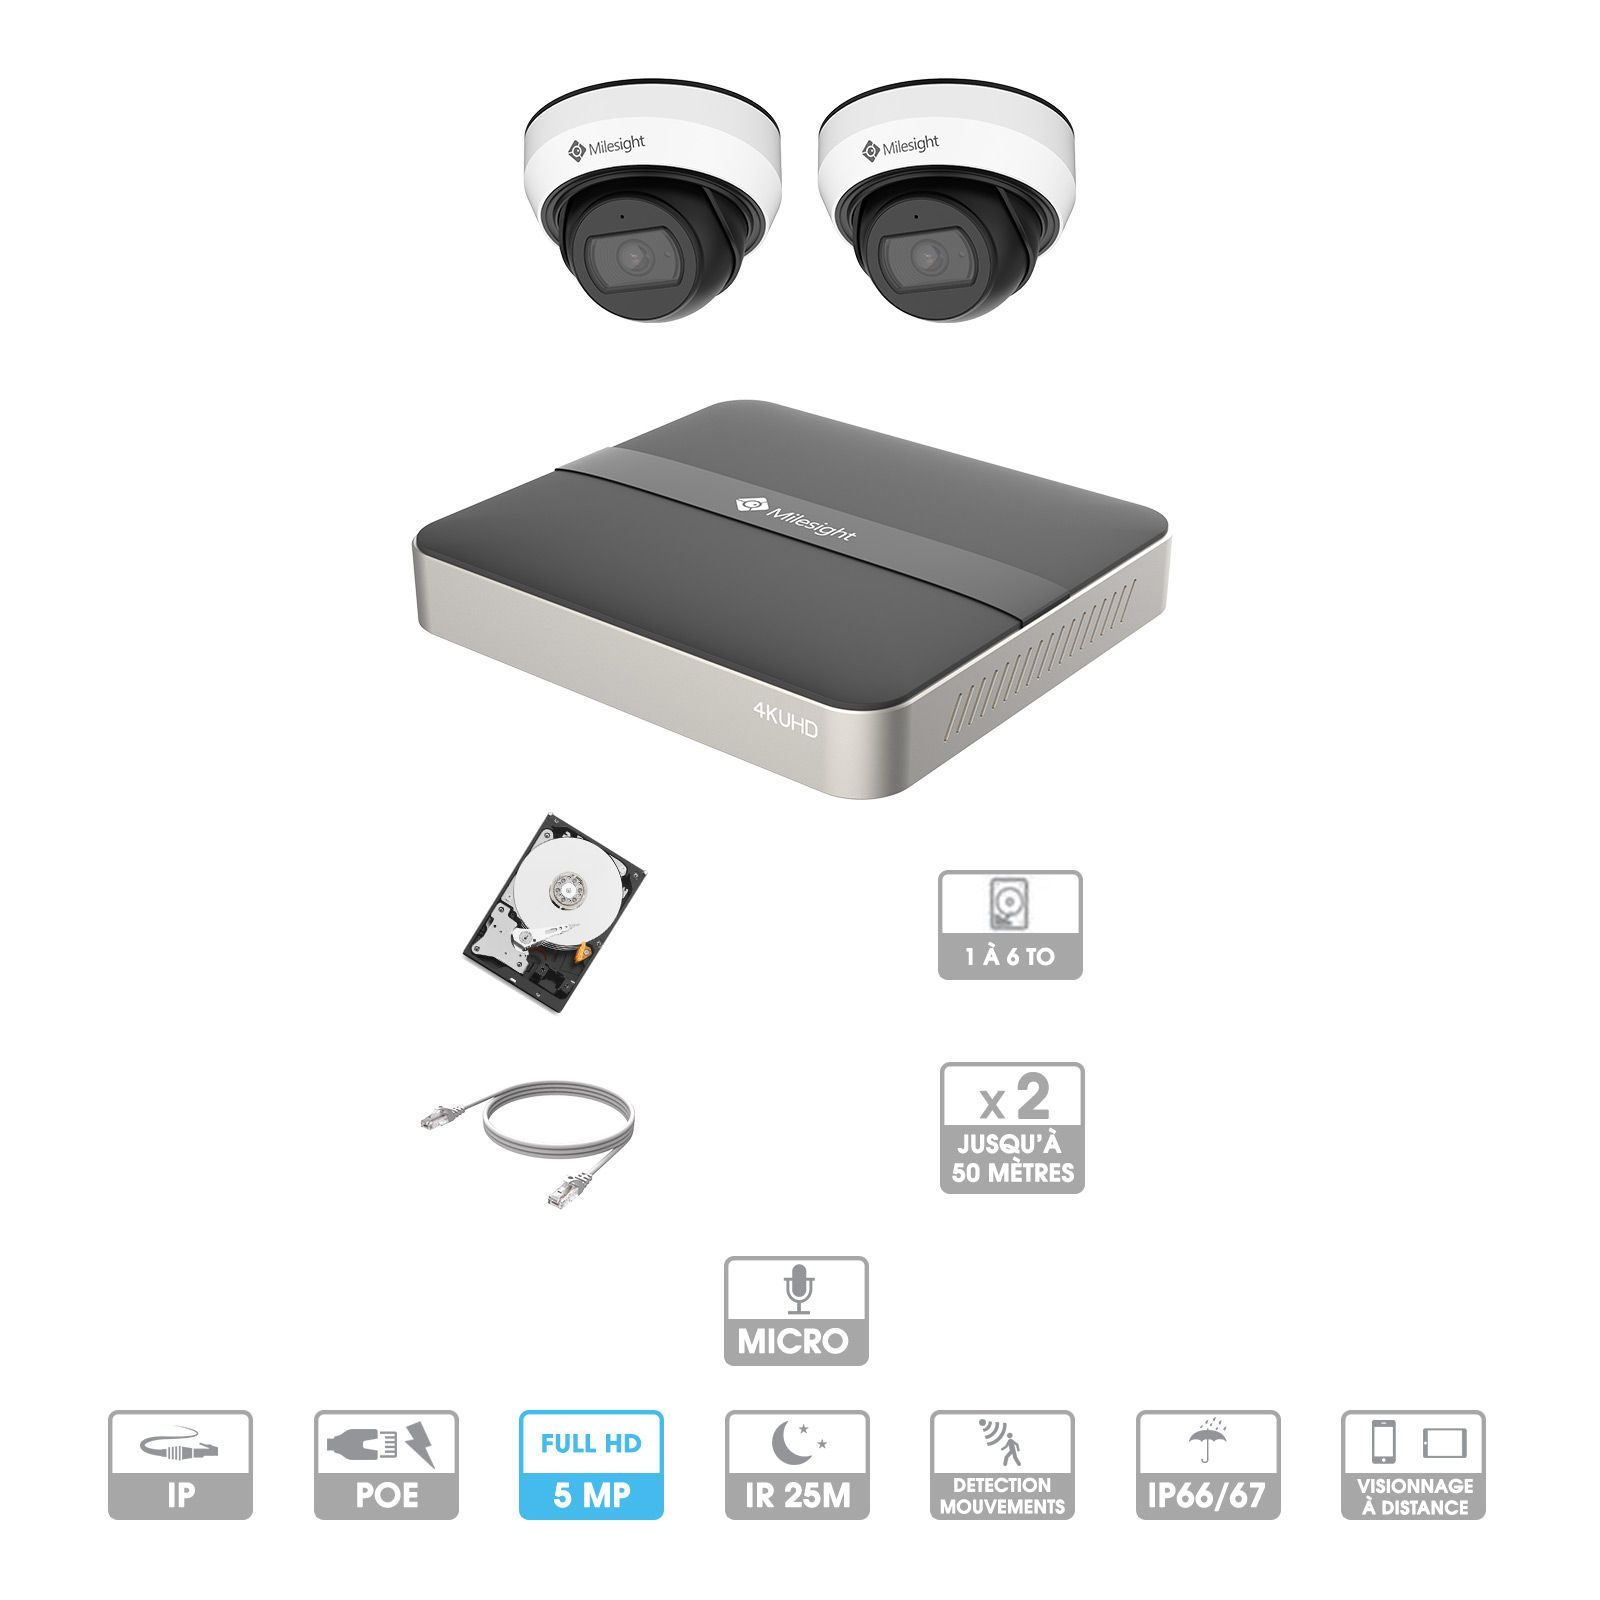 Kit vidéosurveillance 2 caméras | 5 MP | IP PoE | 2 câbles RJ45 20/30/40/50 mètres | HDD 1 à 6 To | Dôme Milesight